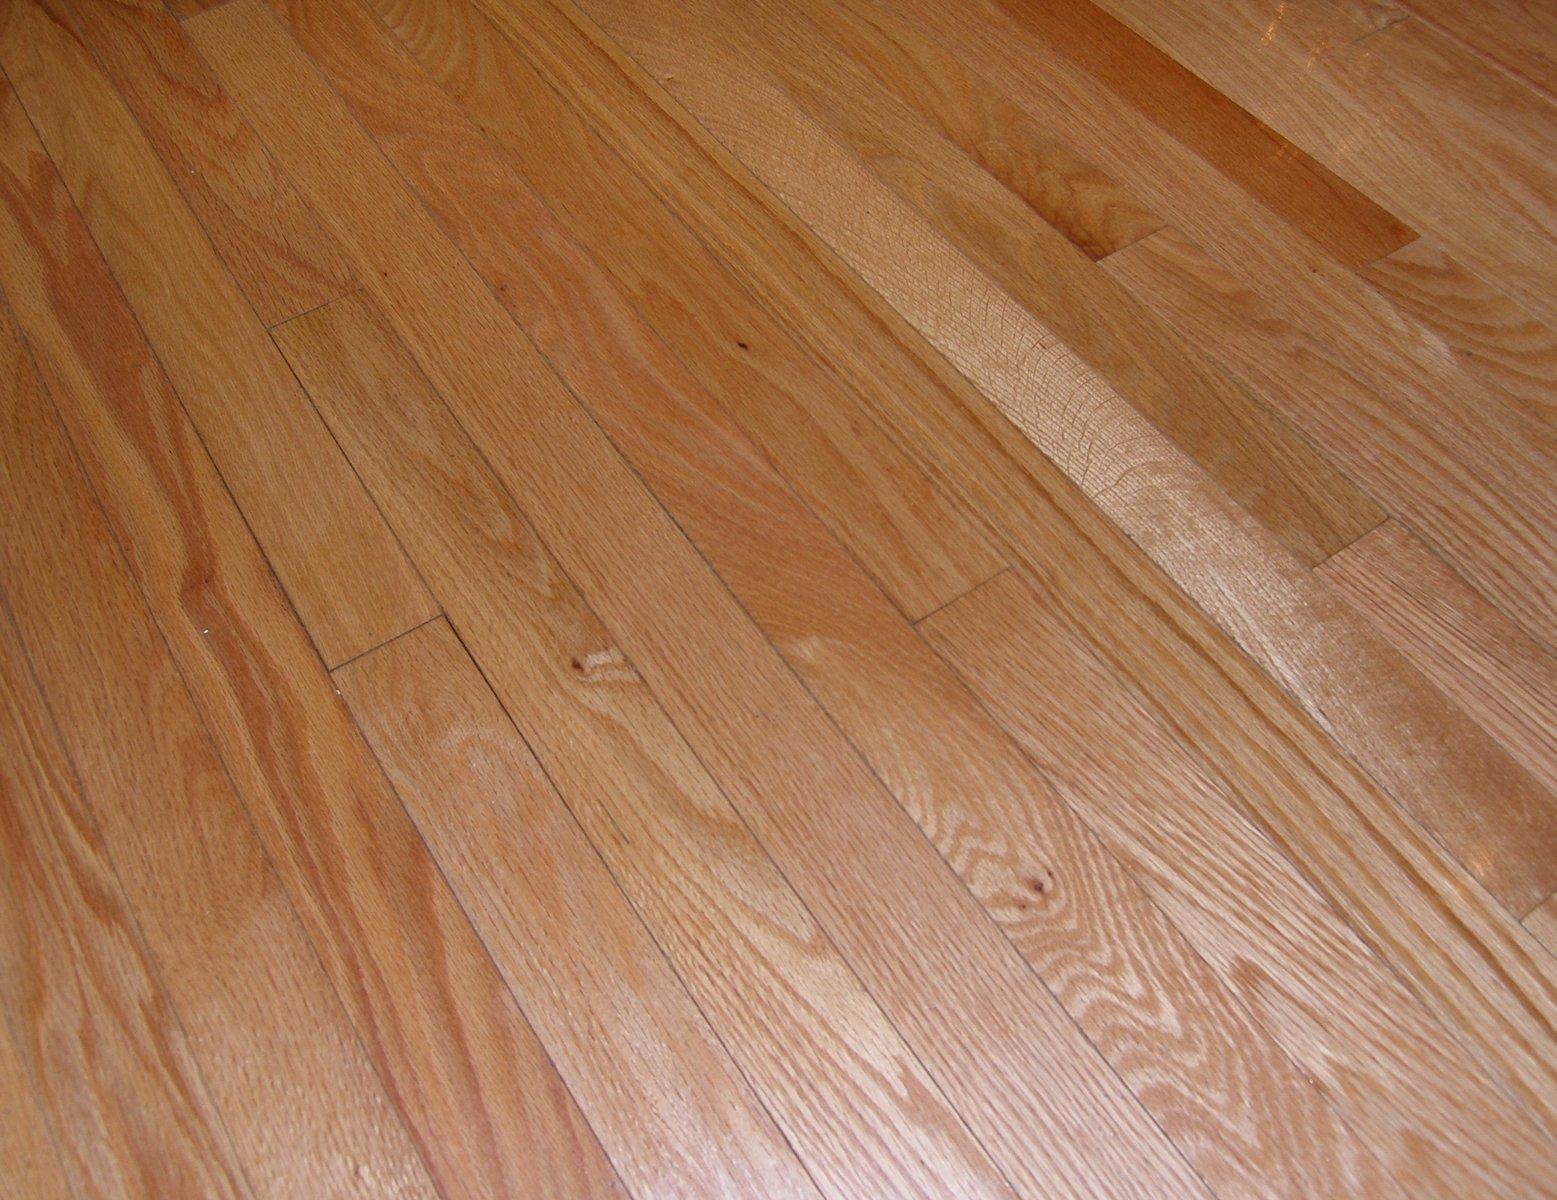 wood texture 2